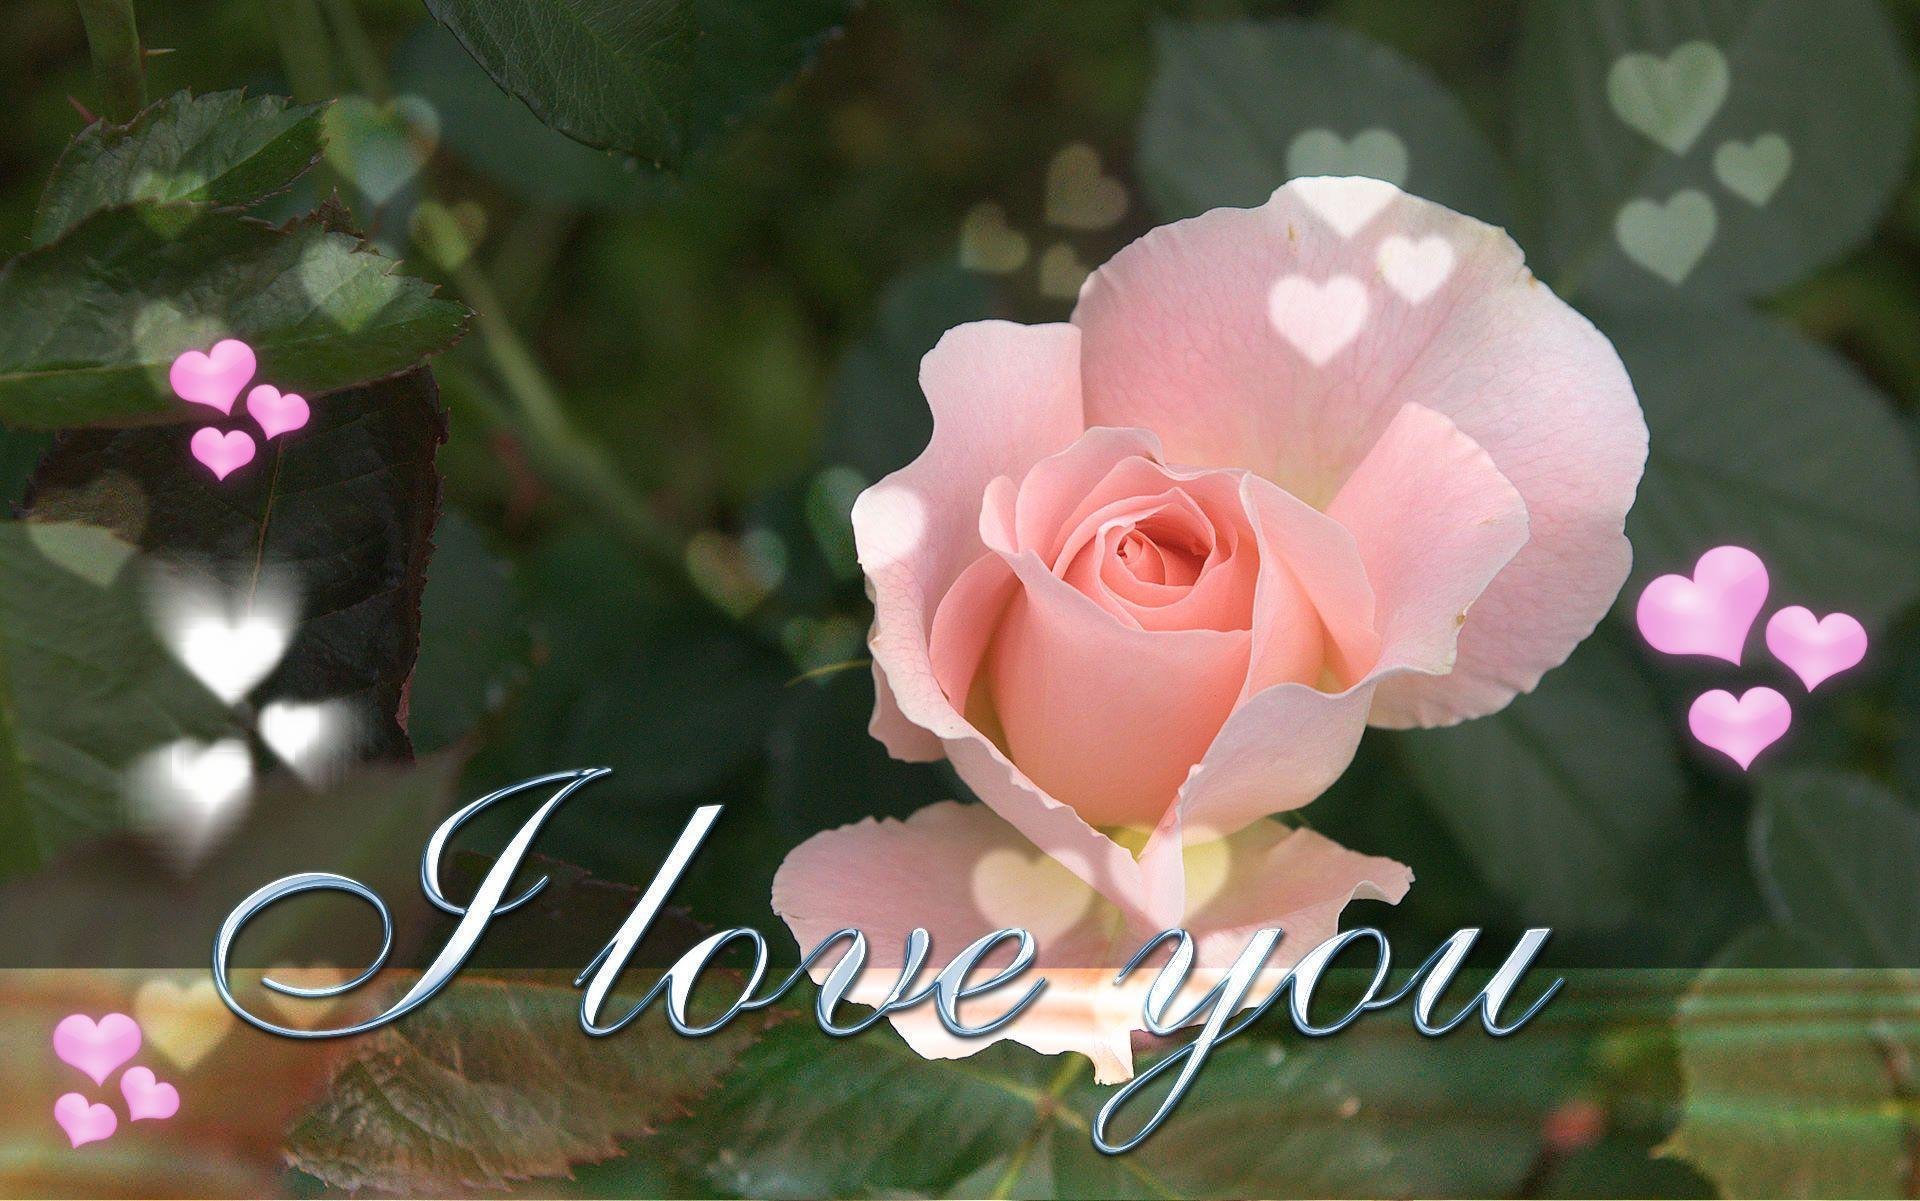 Wallpaper download i love you - I Love You Desktop Wallpaper 34 Wallpapernesia